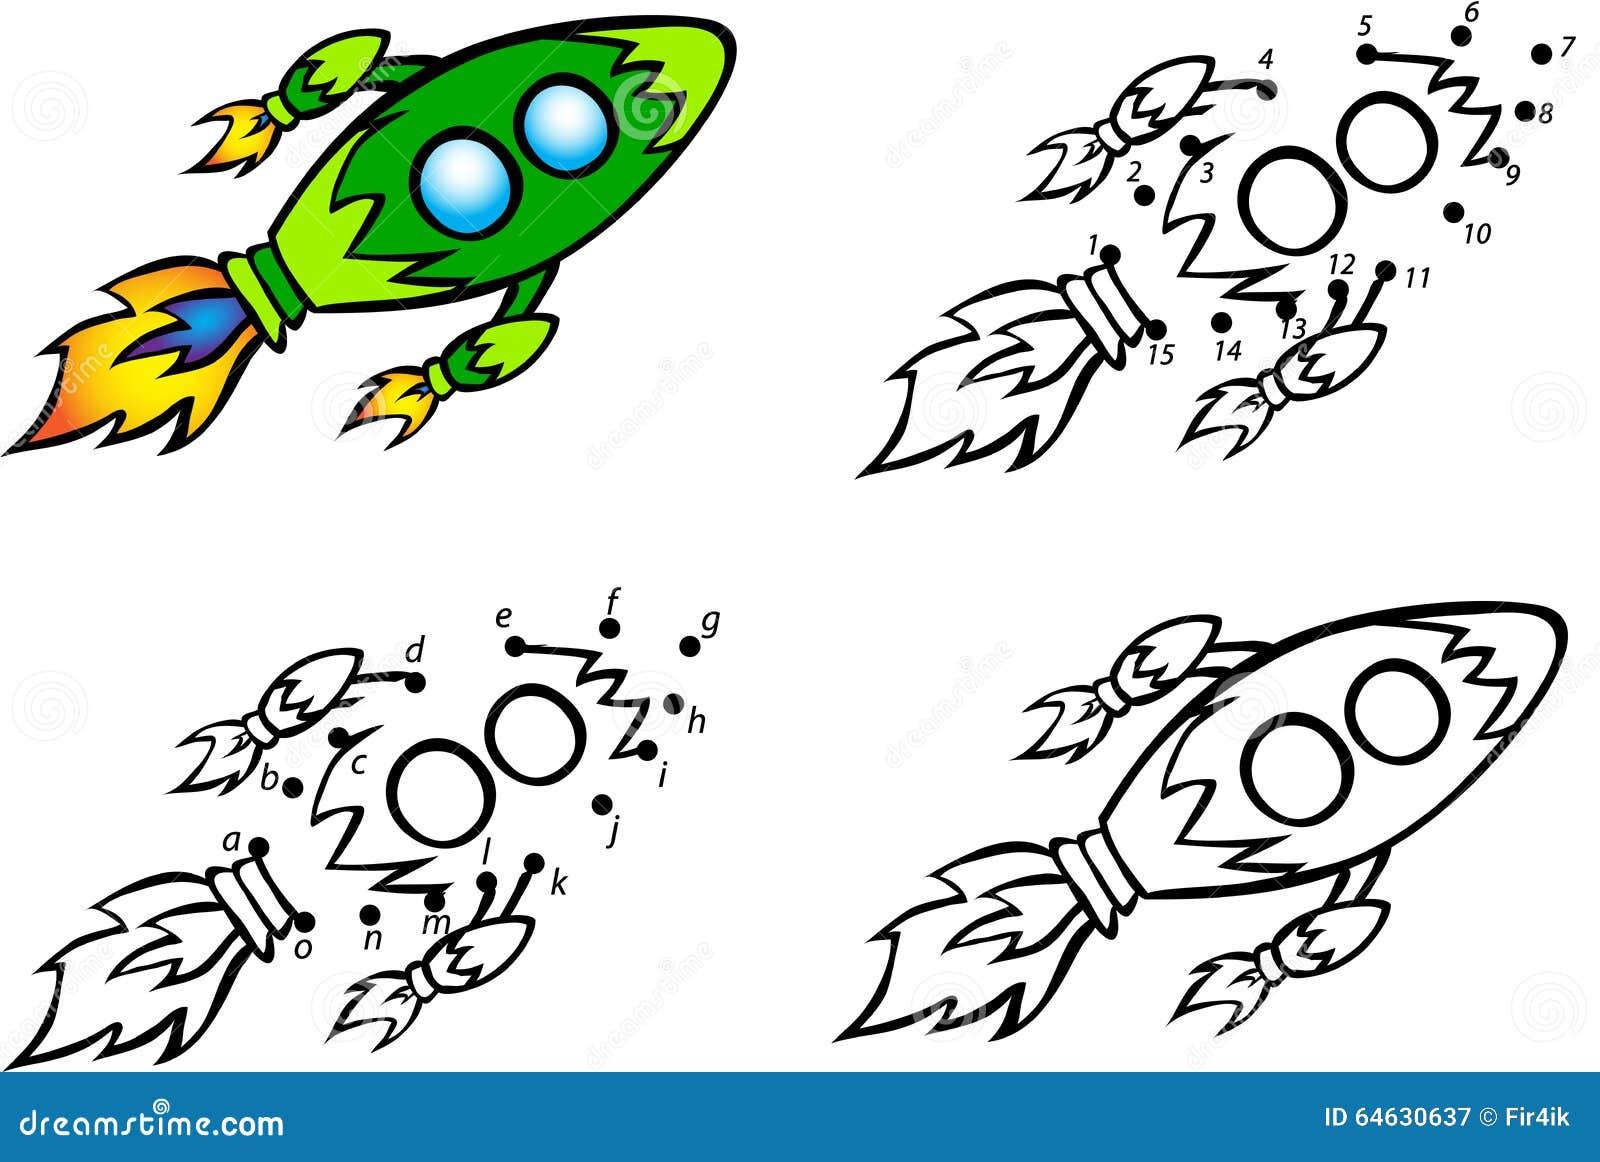 cartoon rocket  vector illustration  coloring and dot to dot gam stock vector